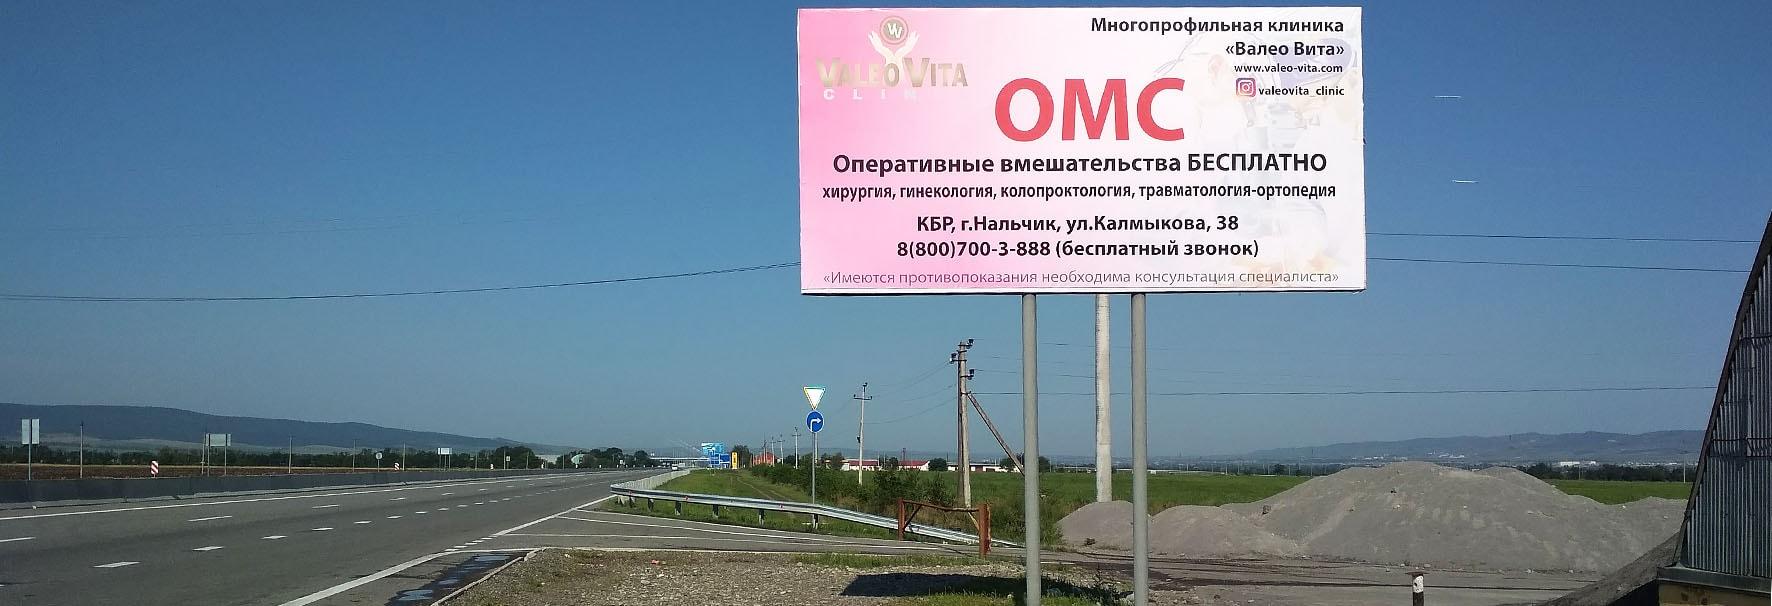 Реклама на щитах 3х6 в Ингушетии билборды